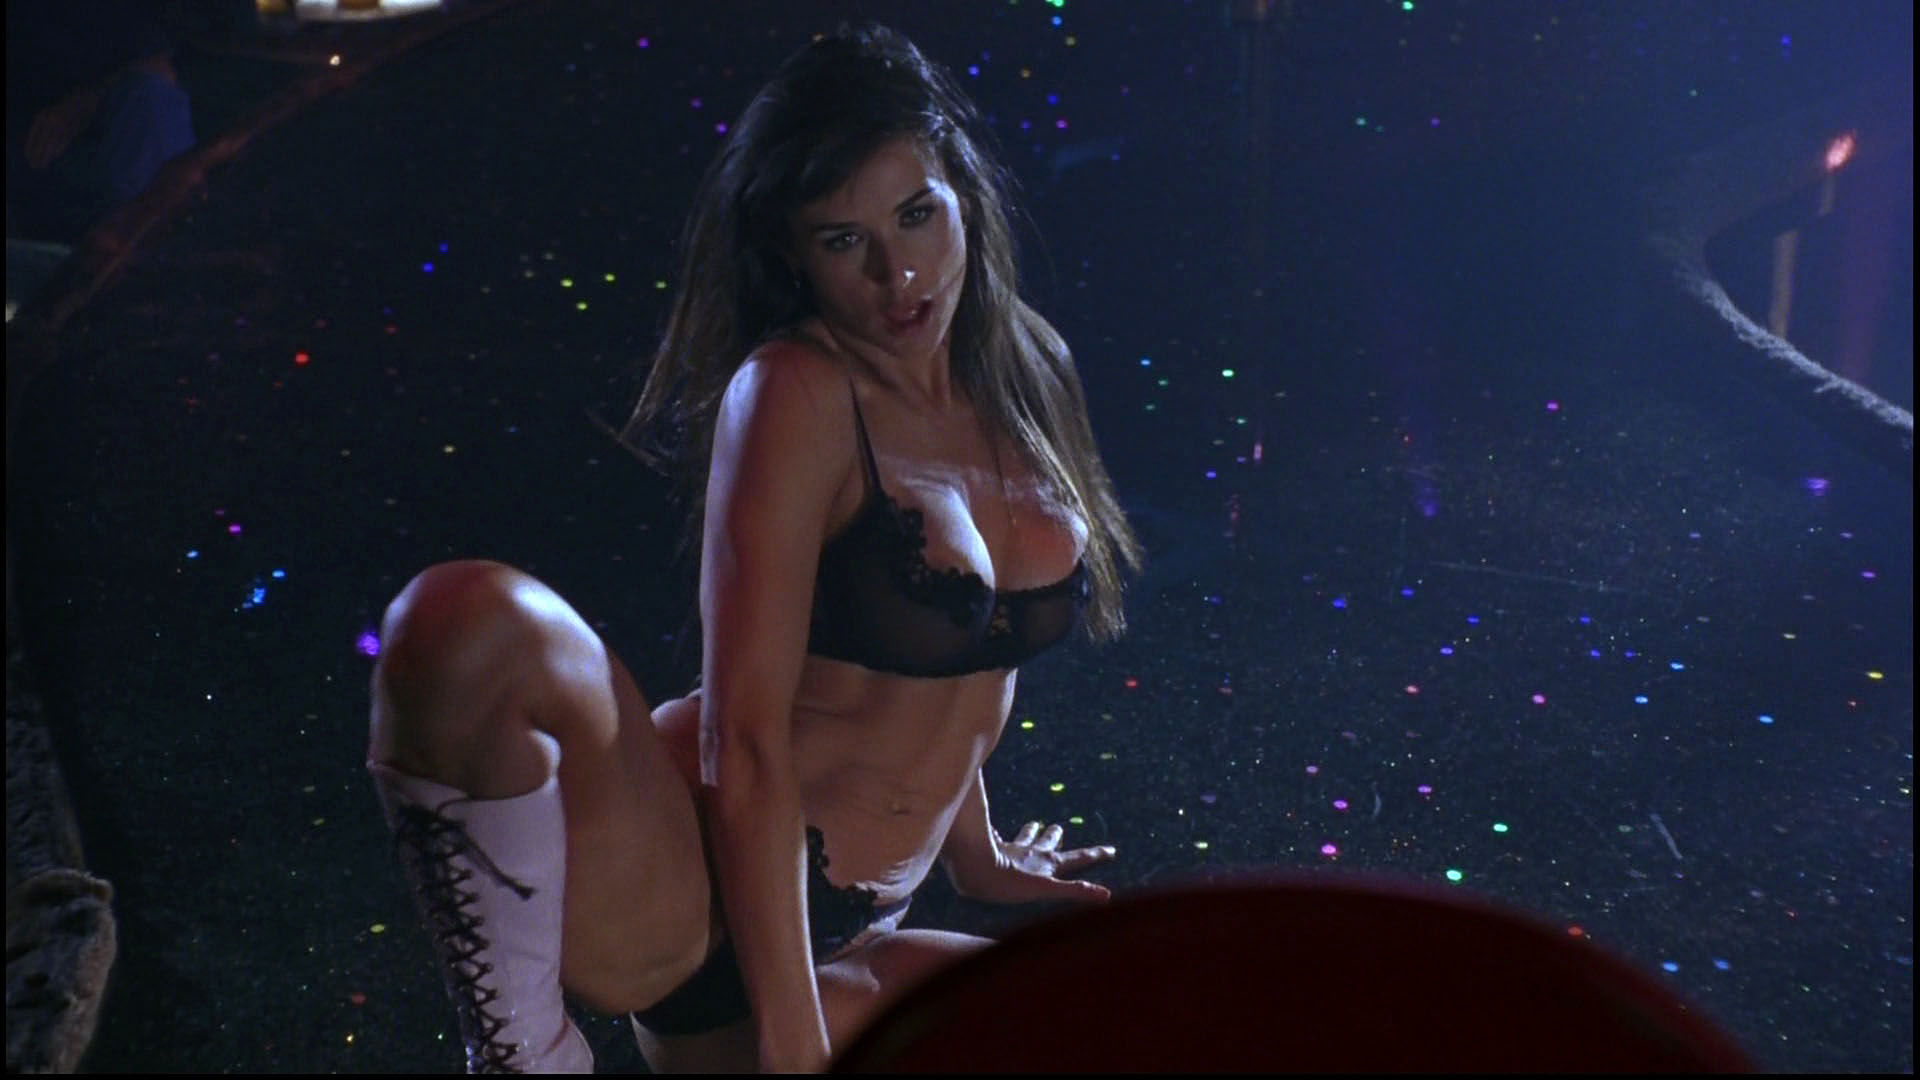 Demi Moore Striptease Videos - Metacafe